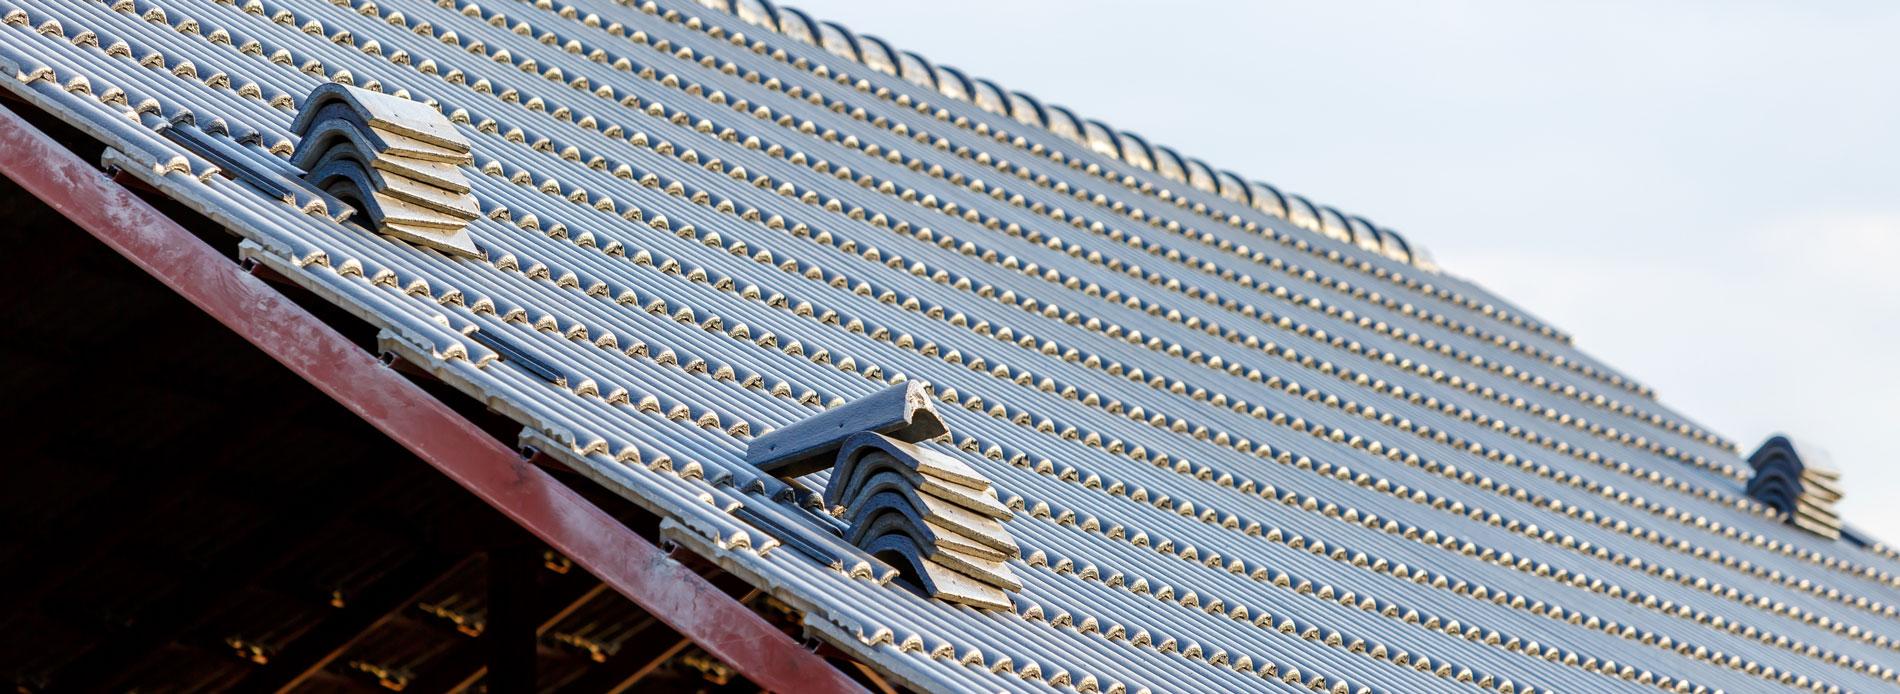 Concrete tile roofing in San Antonio